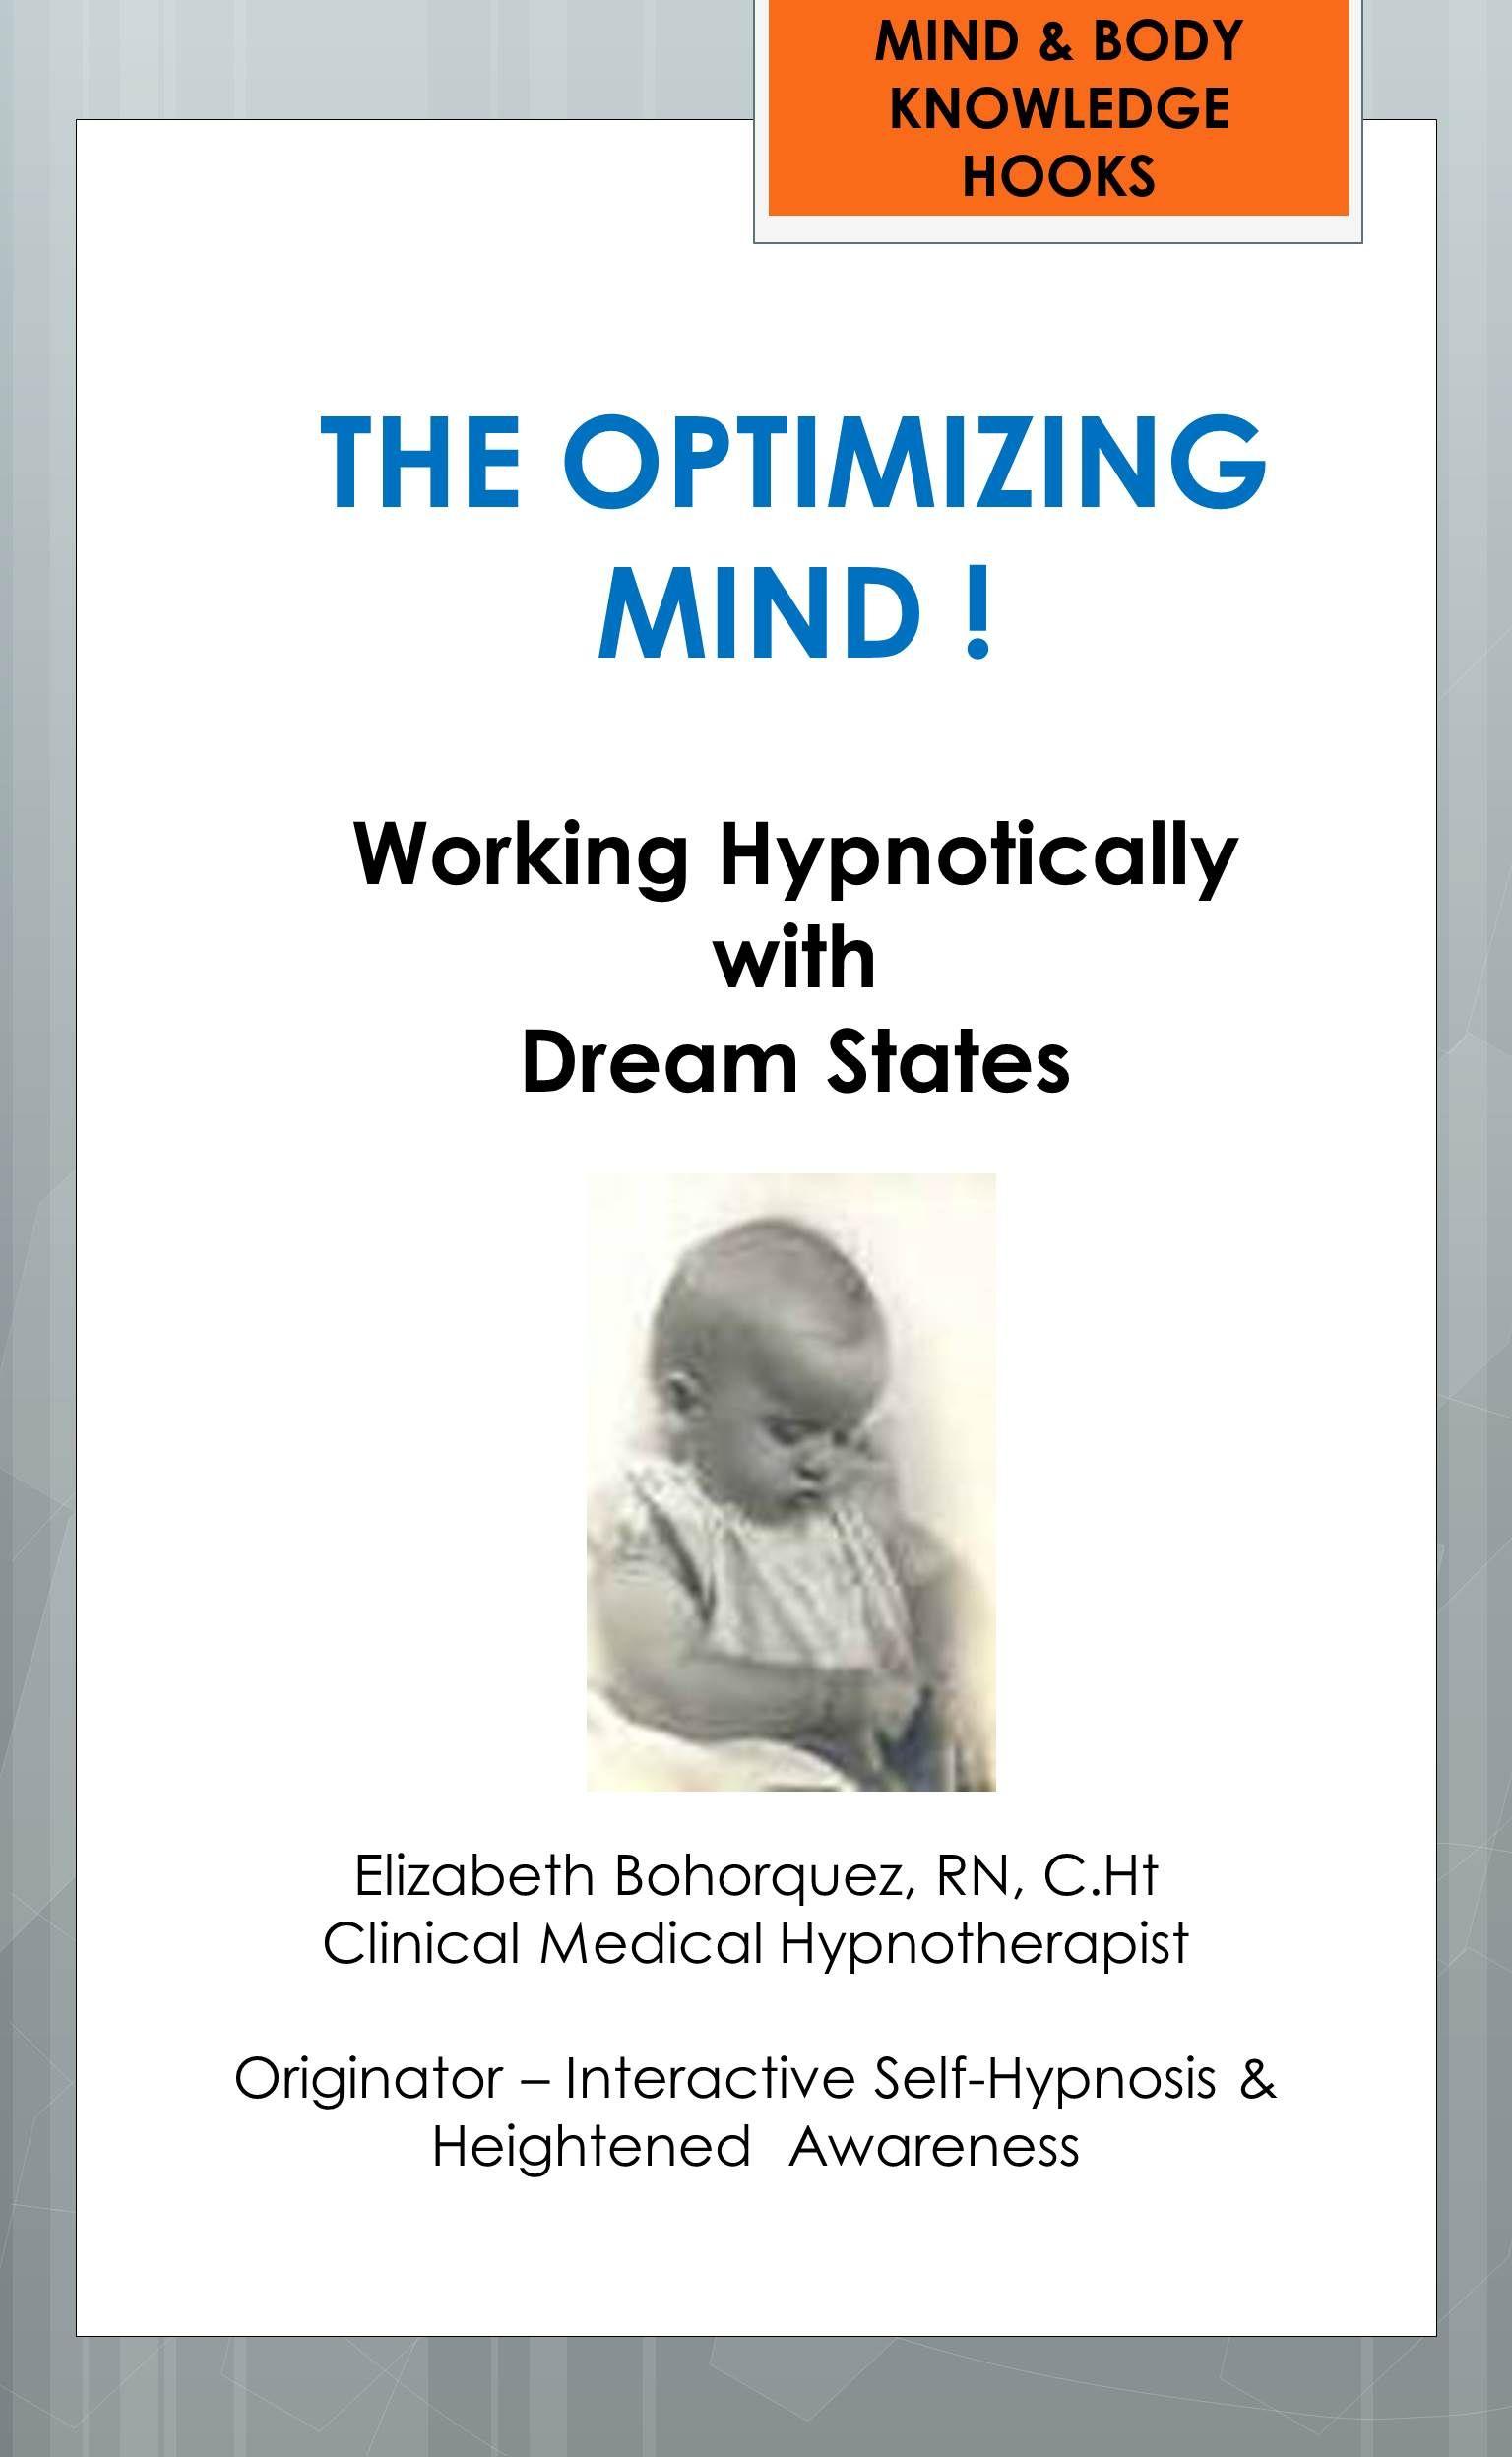 Working with awake & sleep dream states...utilizing Interactive Self-Hypnosis.